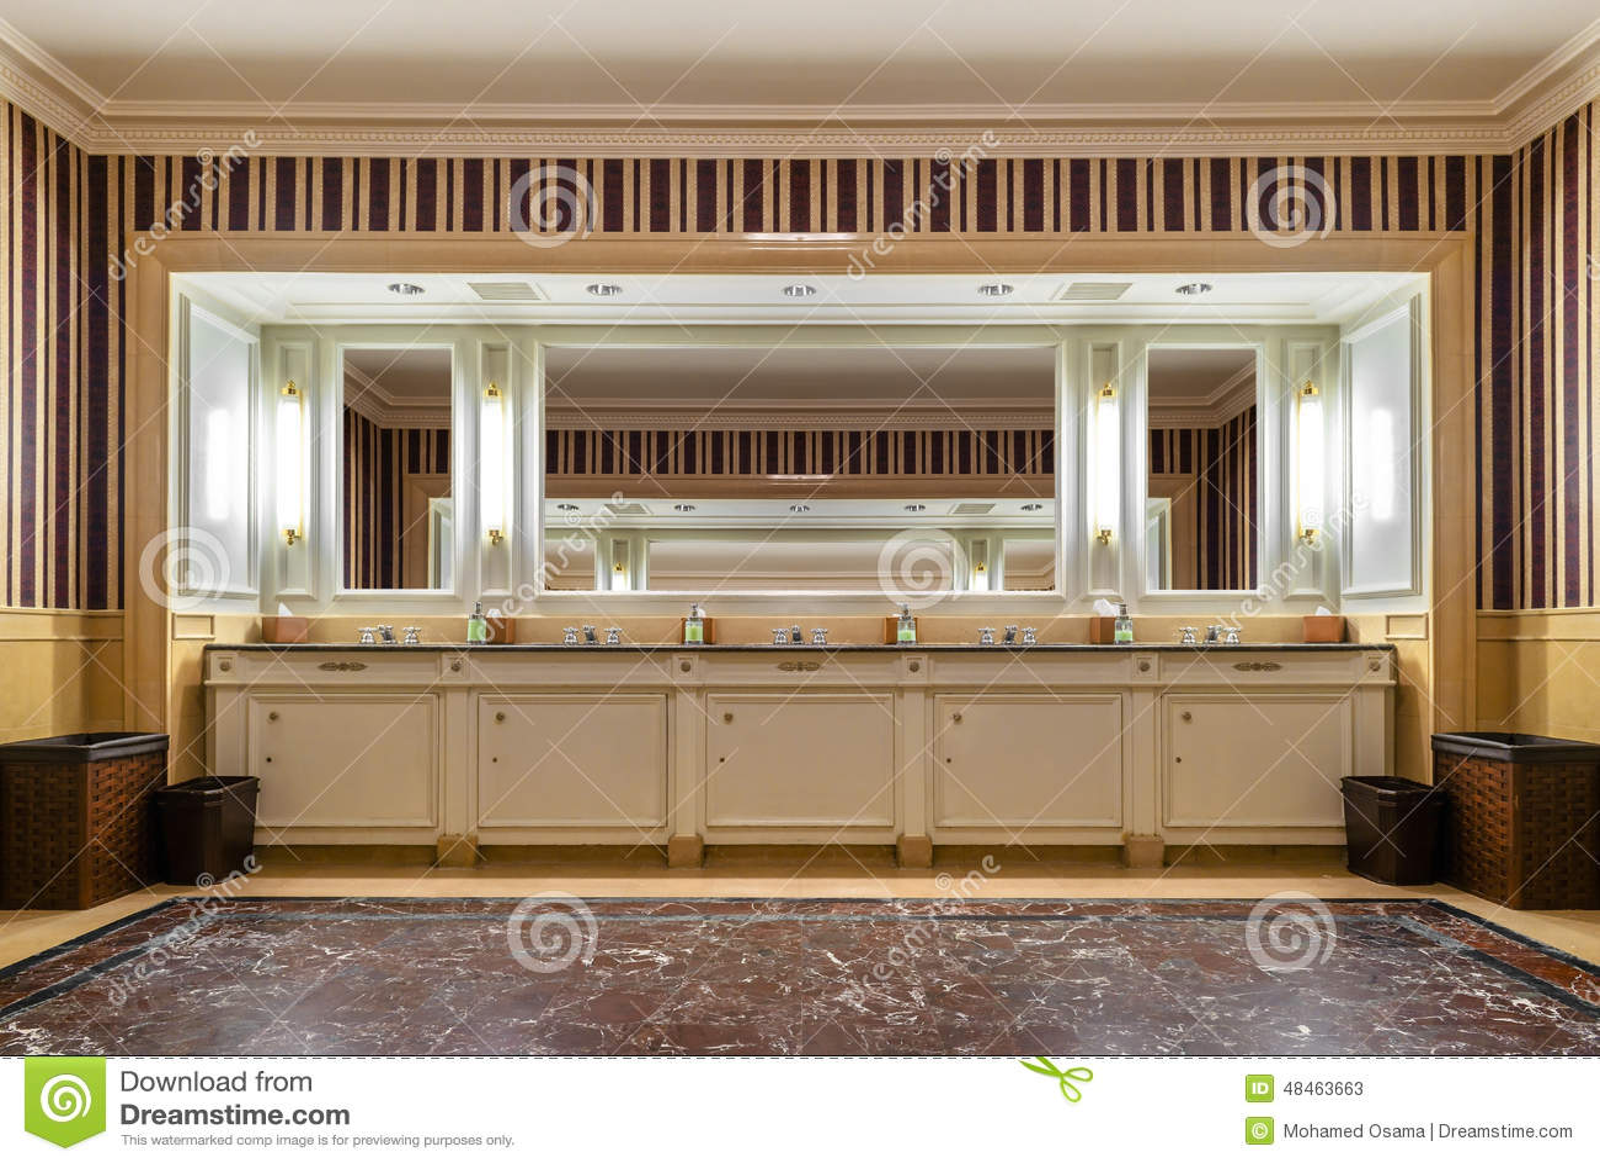 Luxury Hotel Toilet Mirrors Stock Photo  Image 48463663